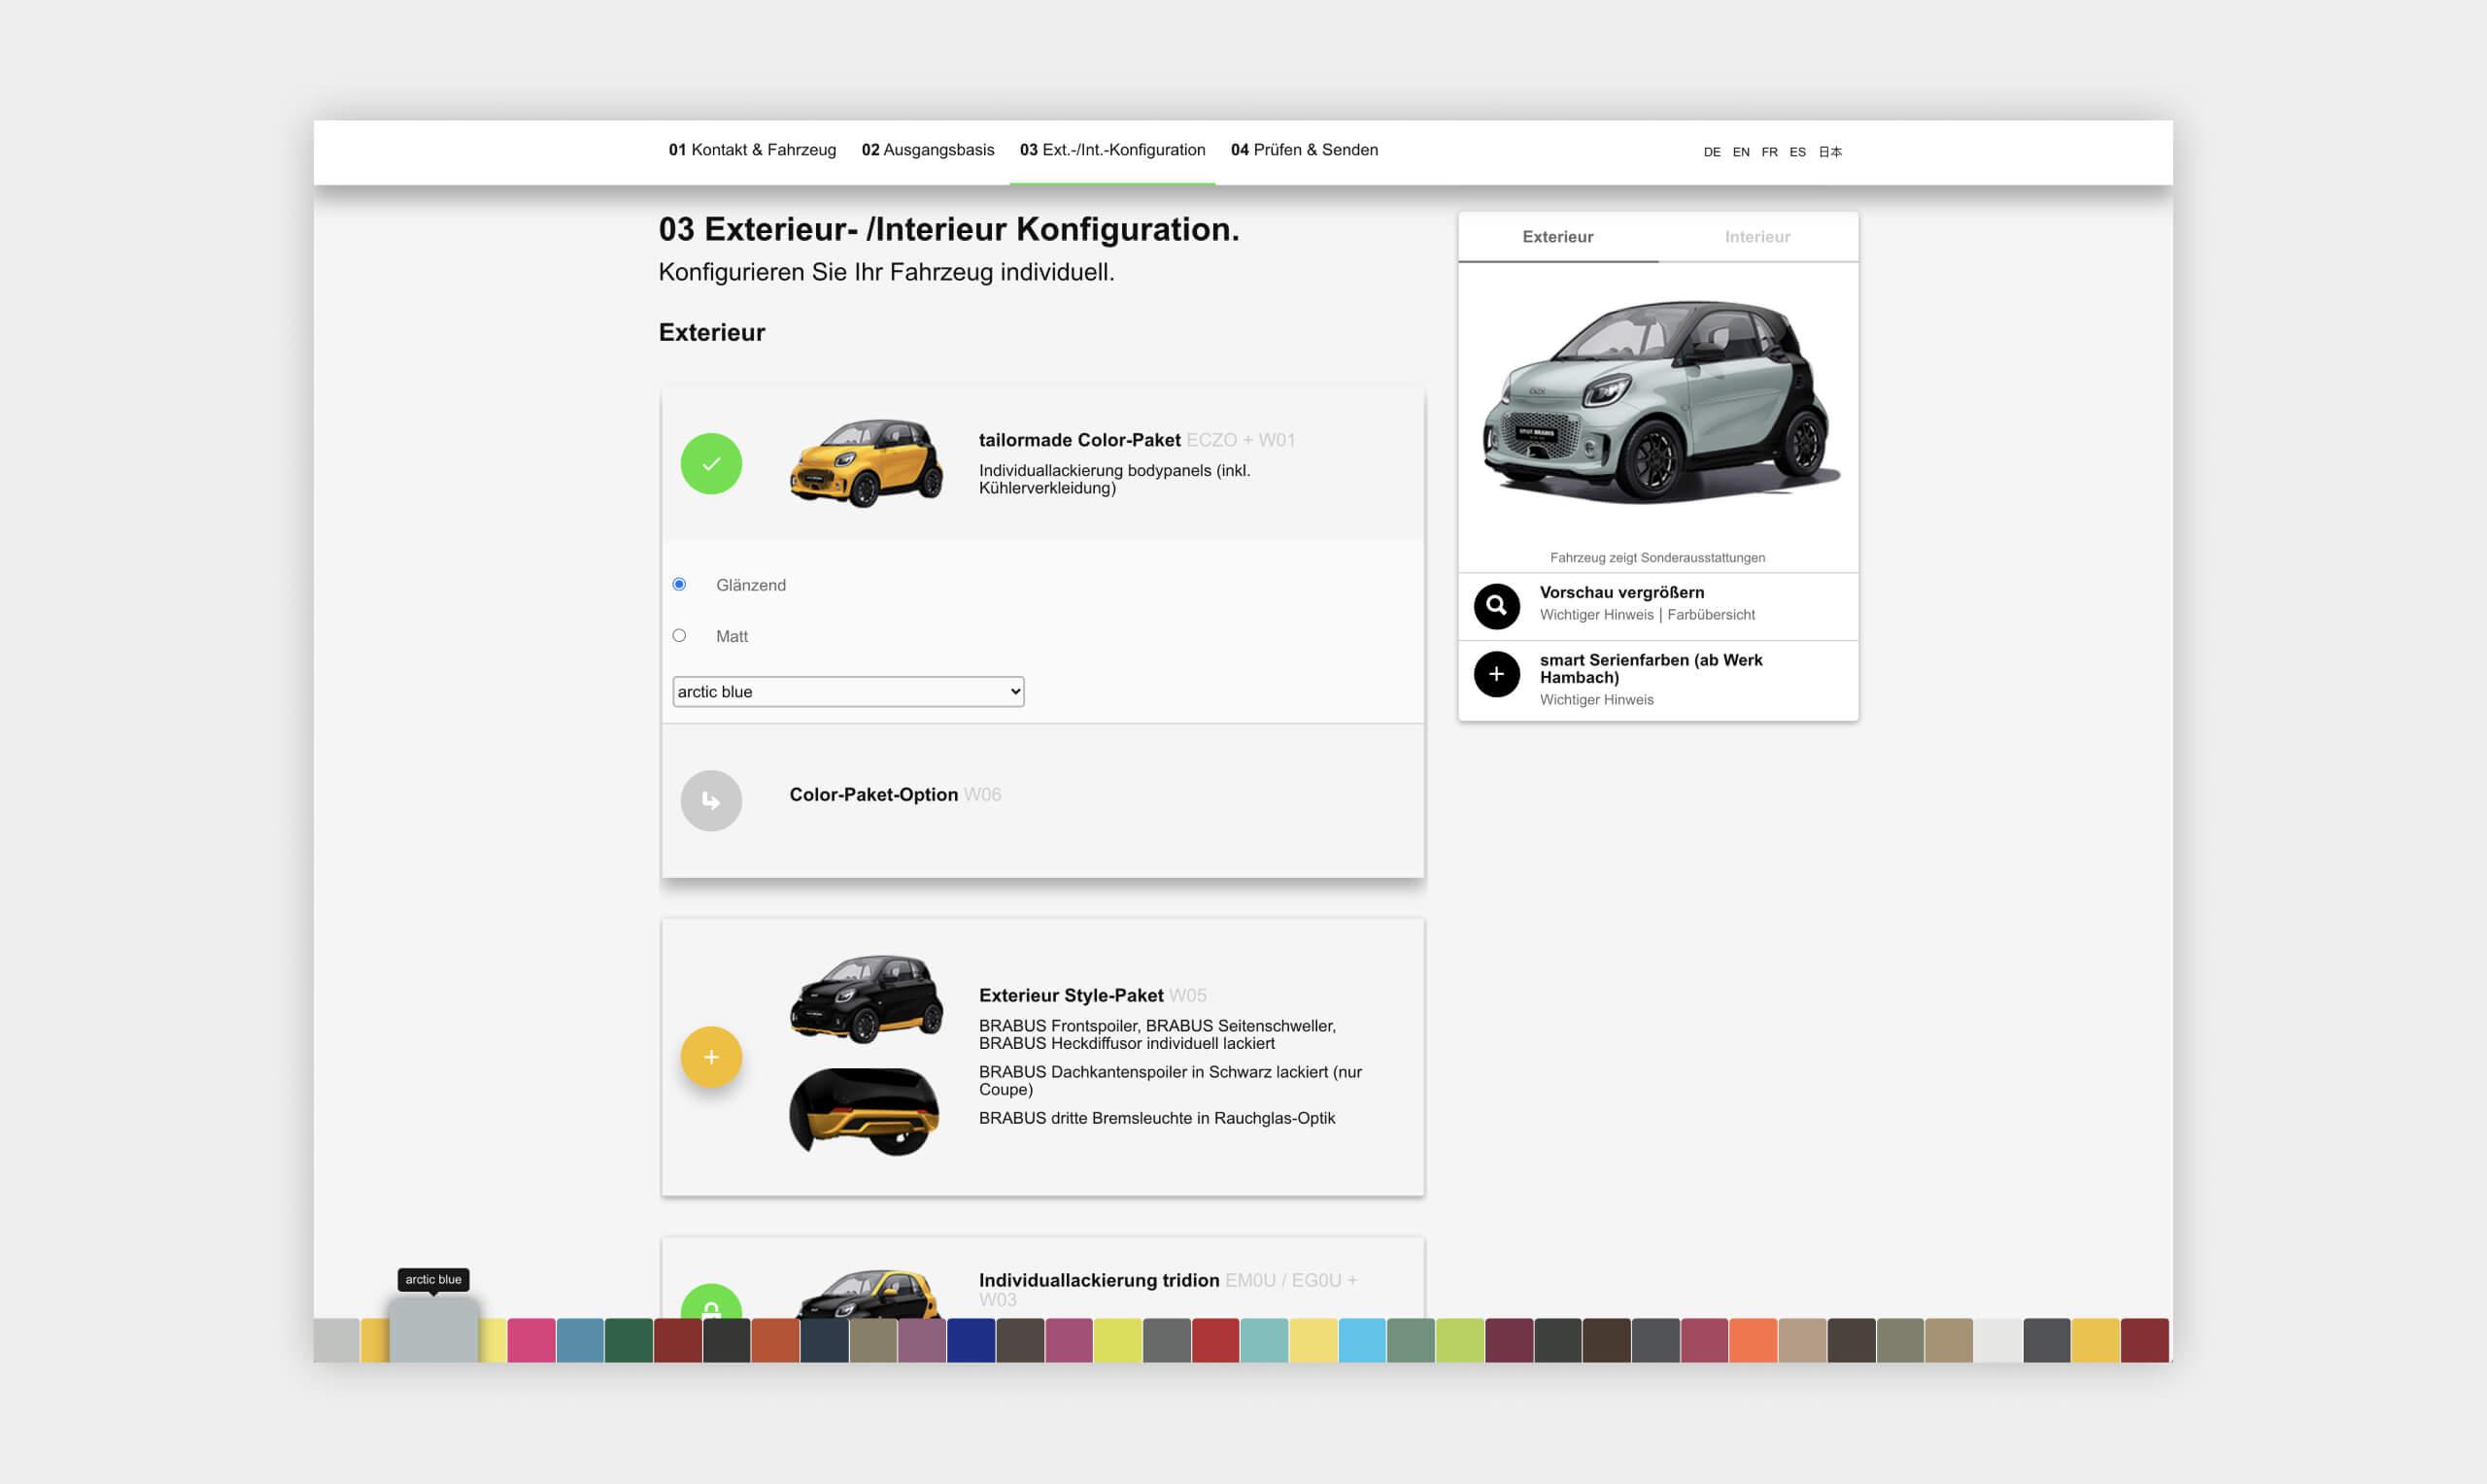 Auszug als Screenshot des smart Brabus Konfigurators vom Ex-/Interieurbereich.